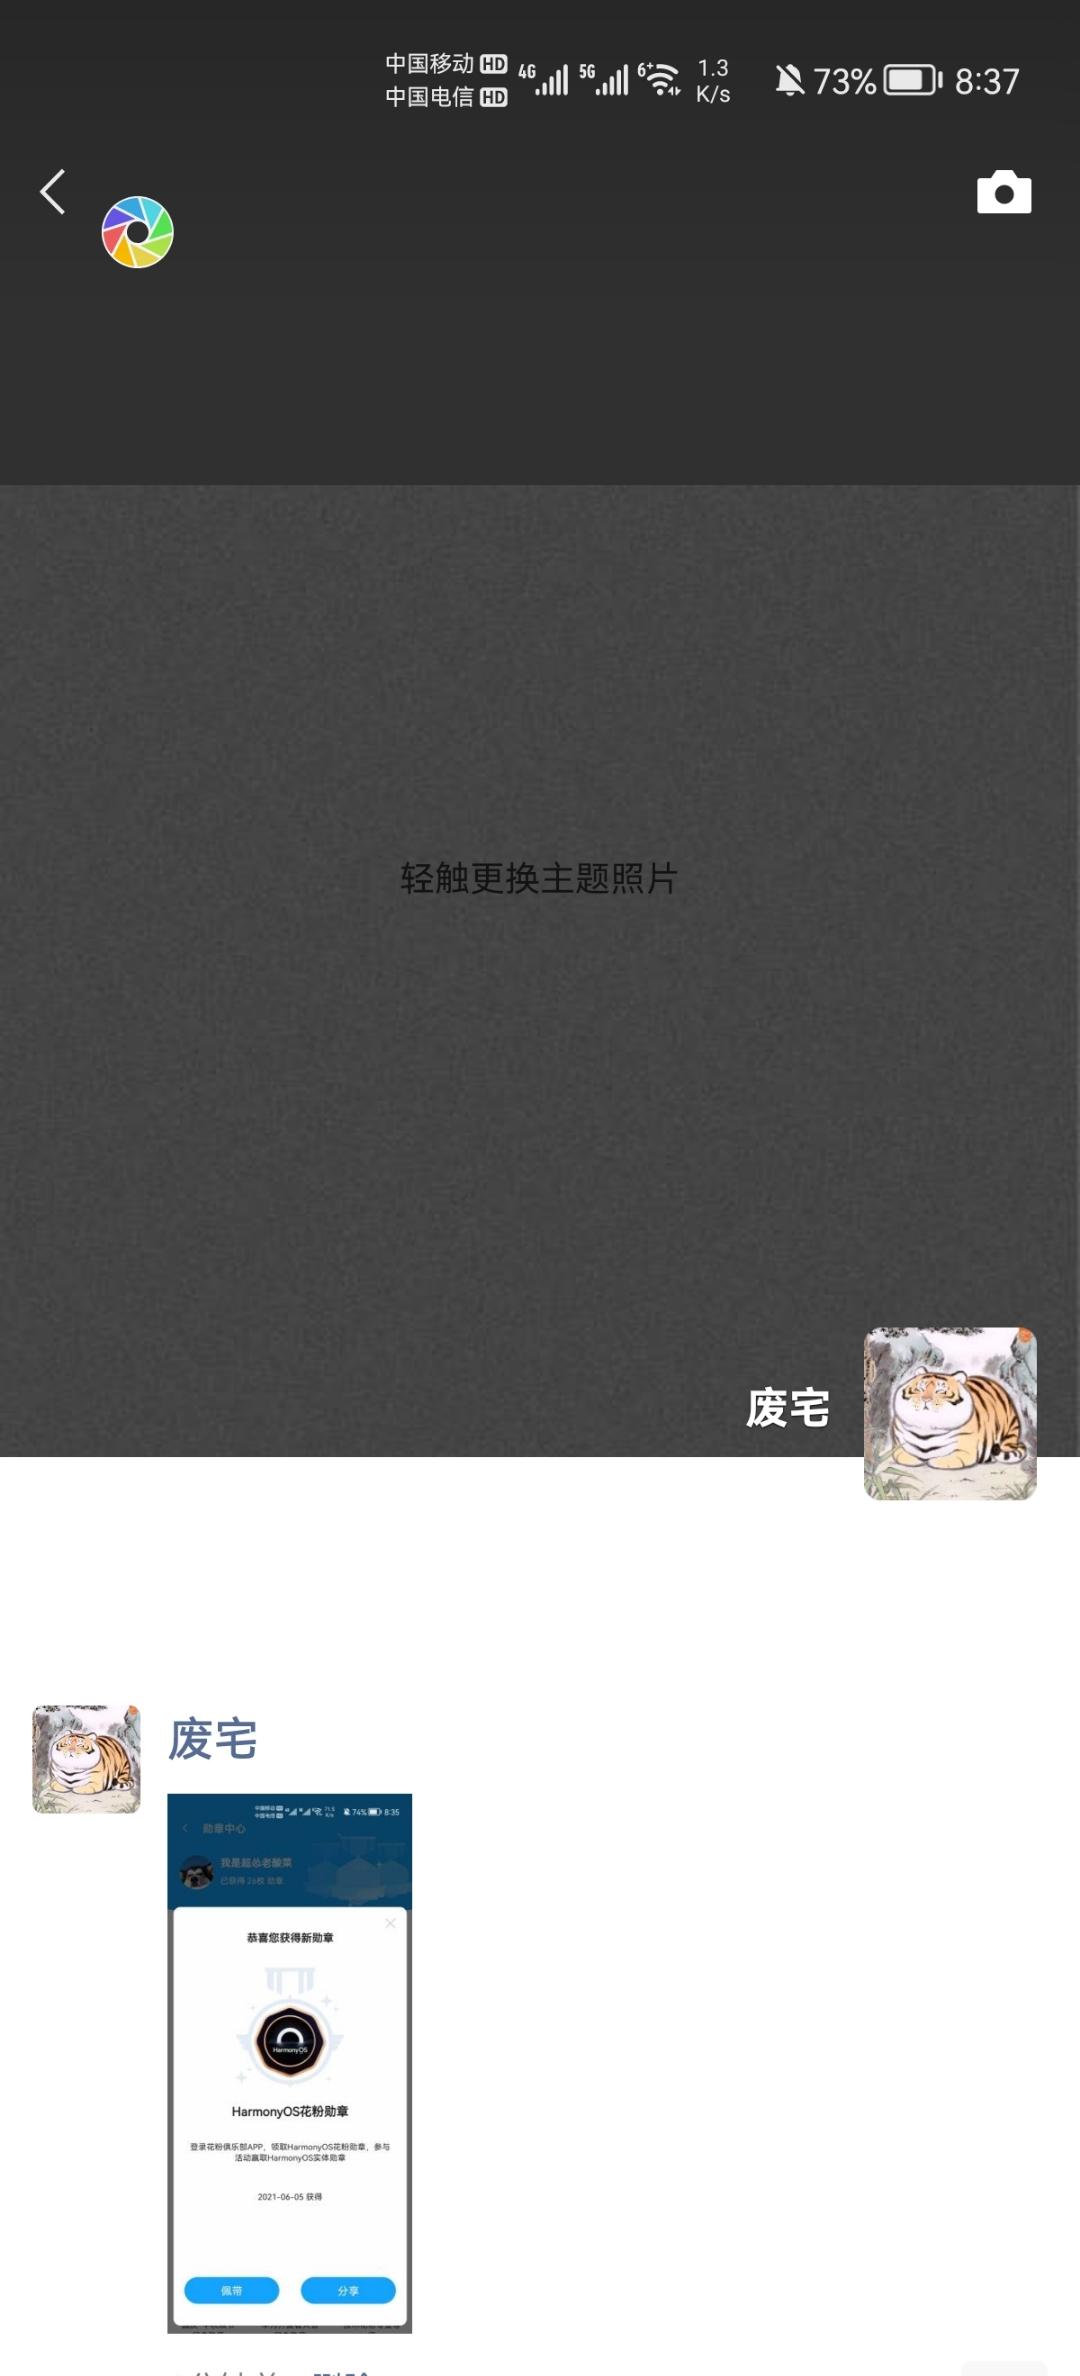 Screenshot_20210605_203753_com.tencent.mm.jpg